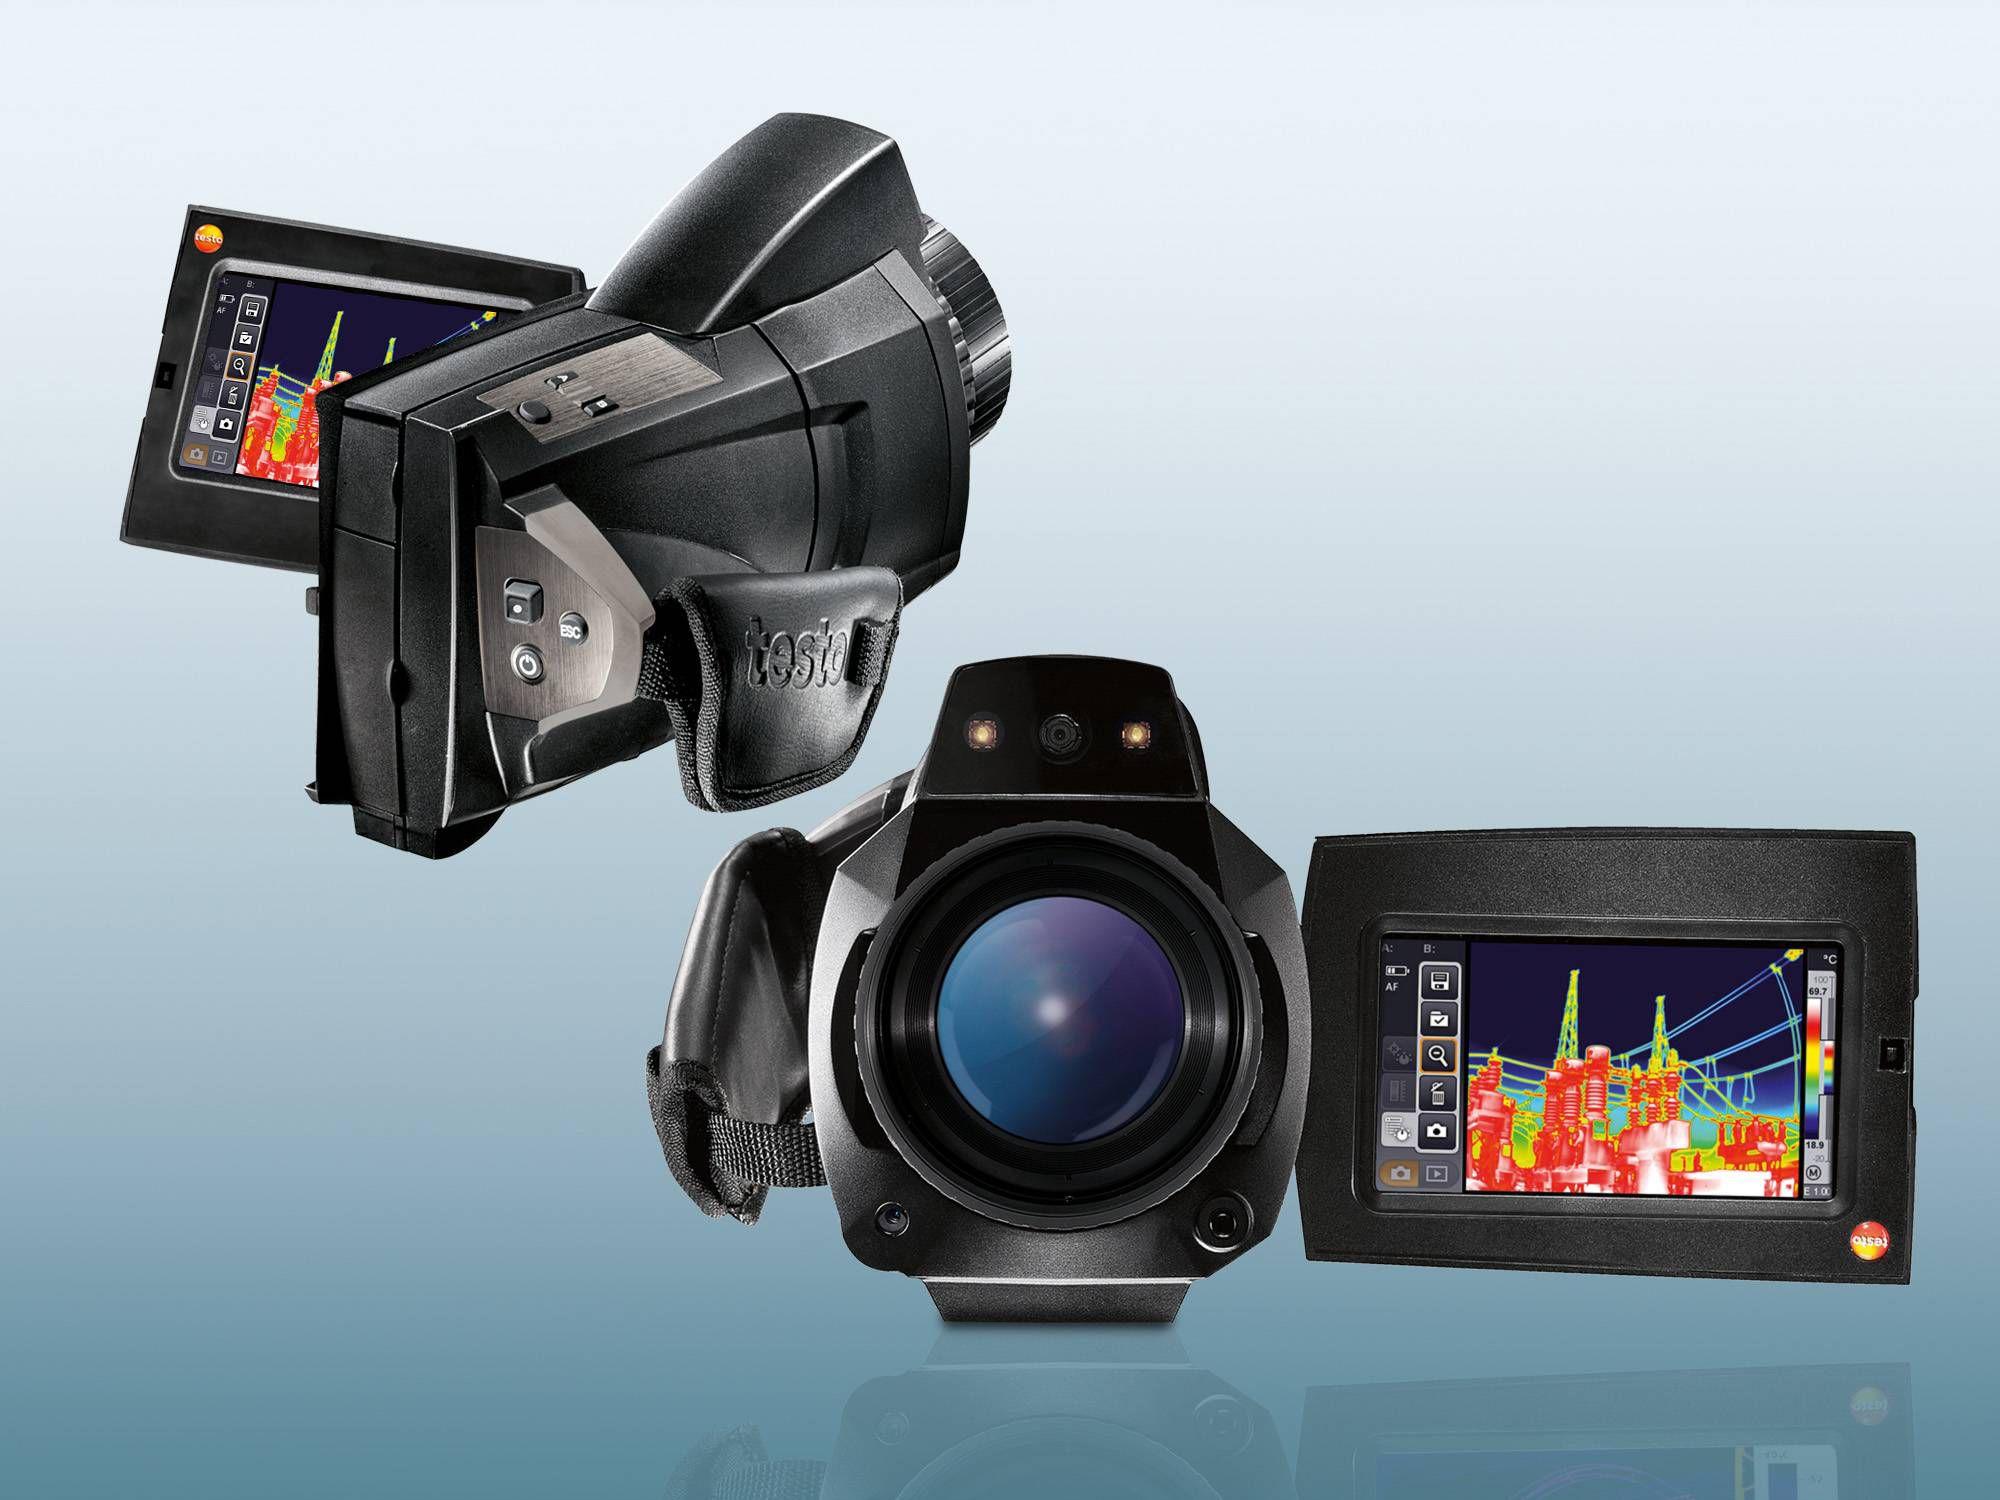 Thermal imager testo 885 and testo 890